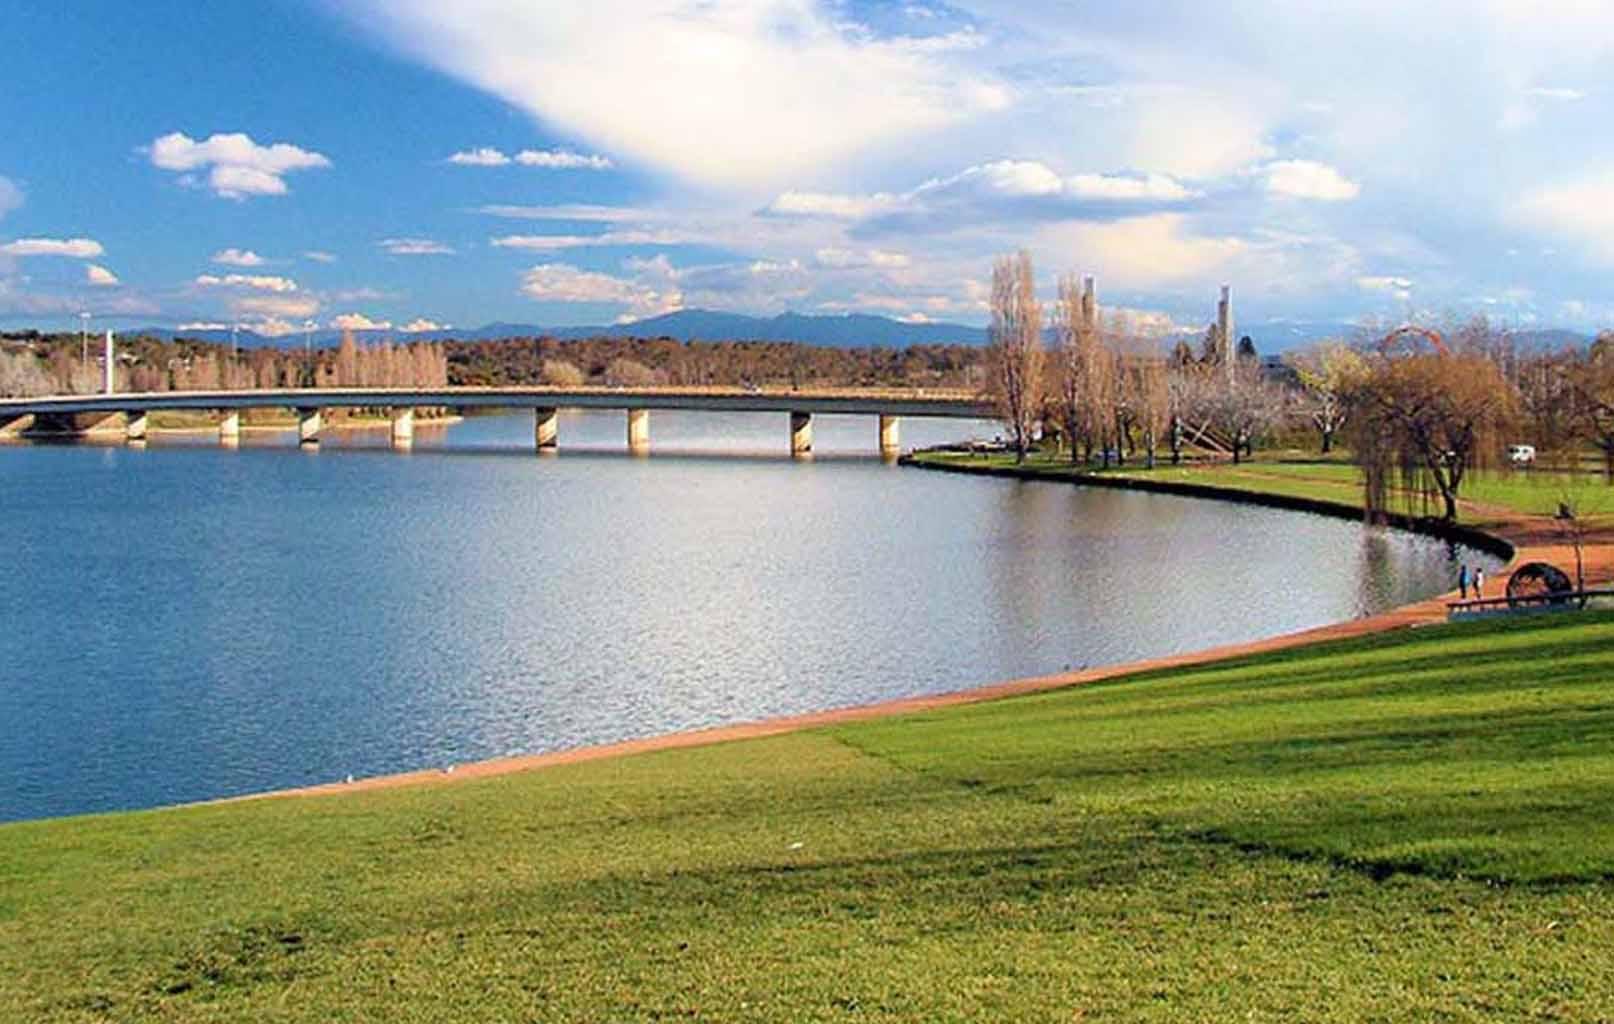 Hồ Burley Griffin